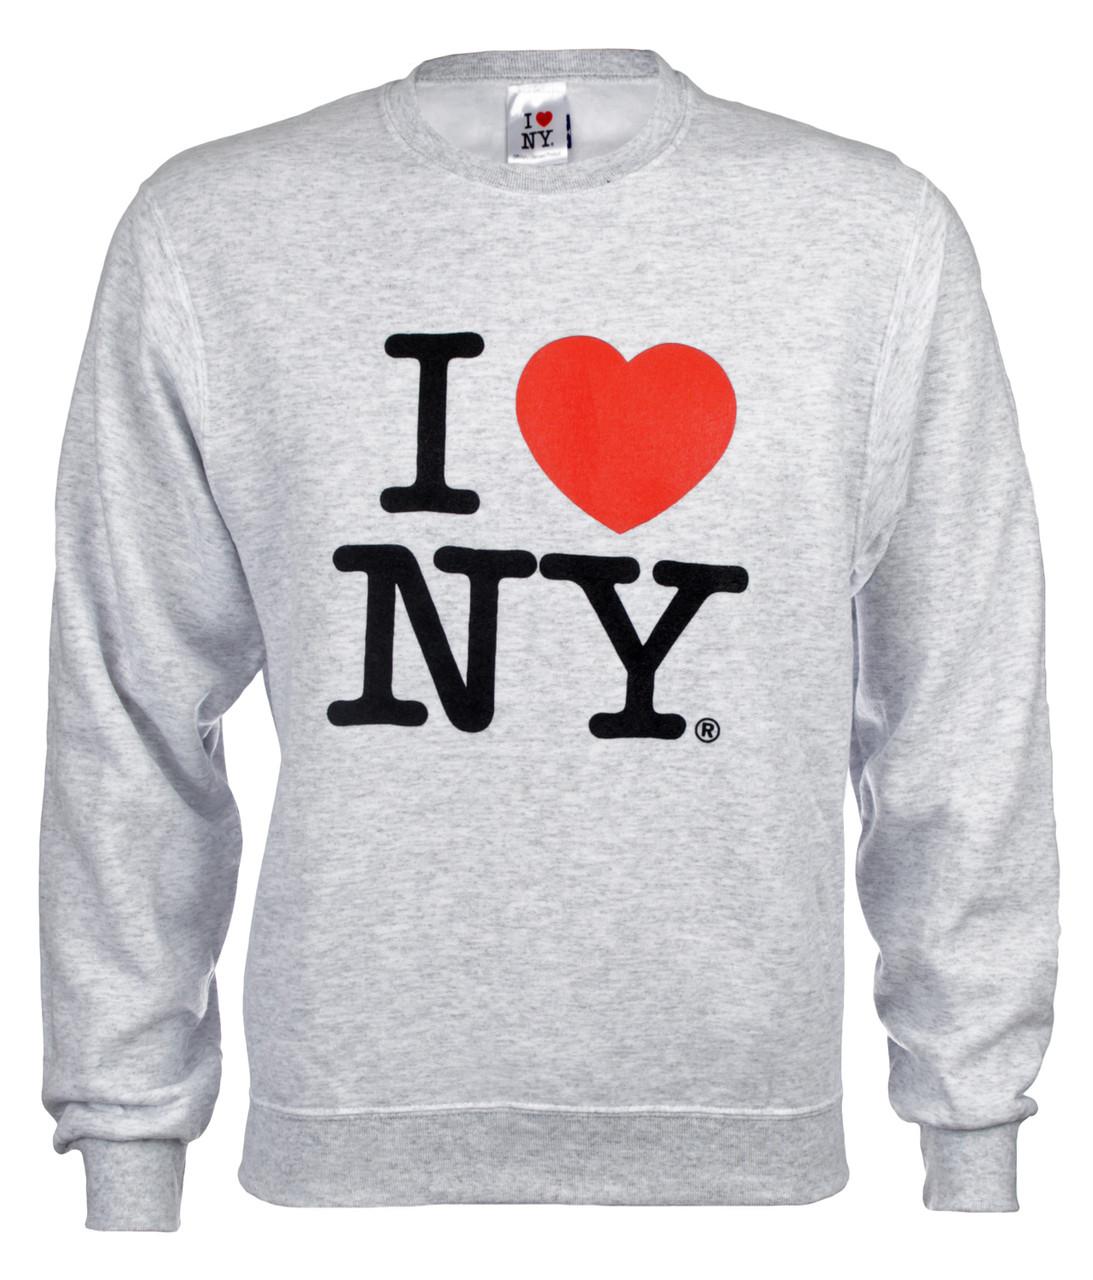 I love ny crewneck sweatshirt grey altavistaventures Choice Image